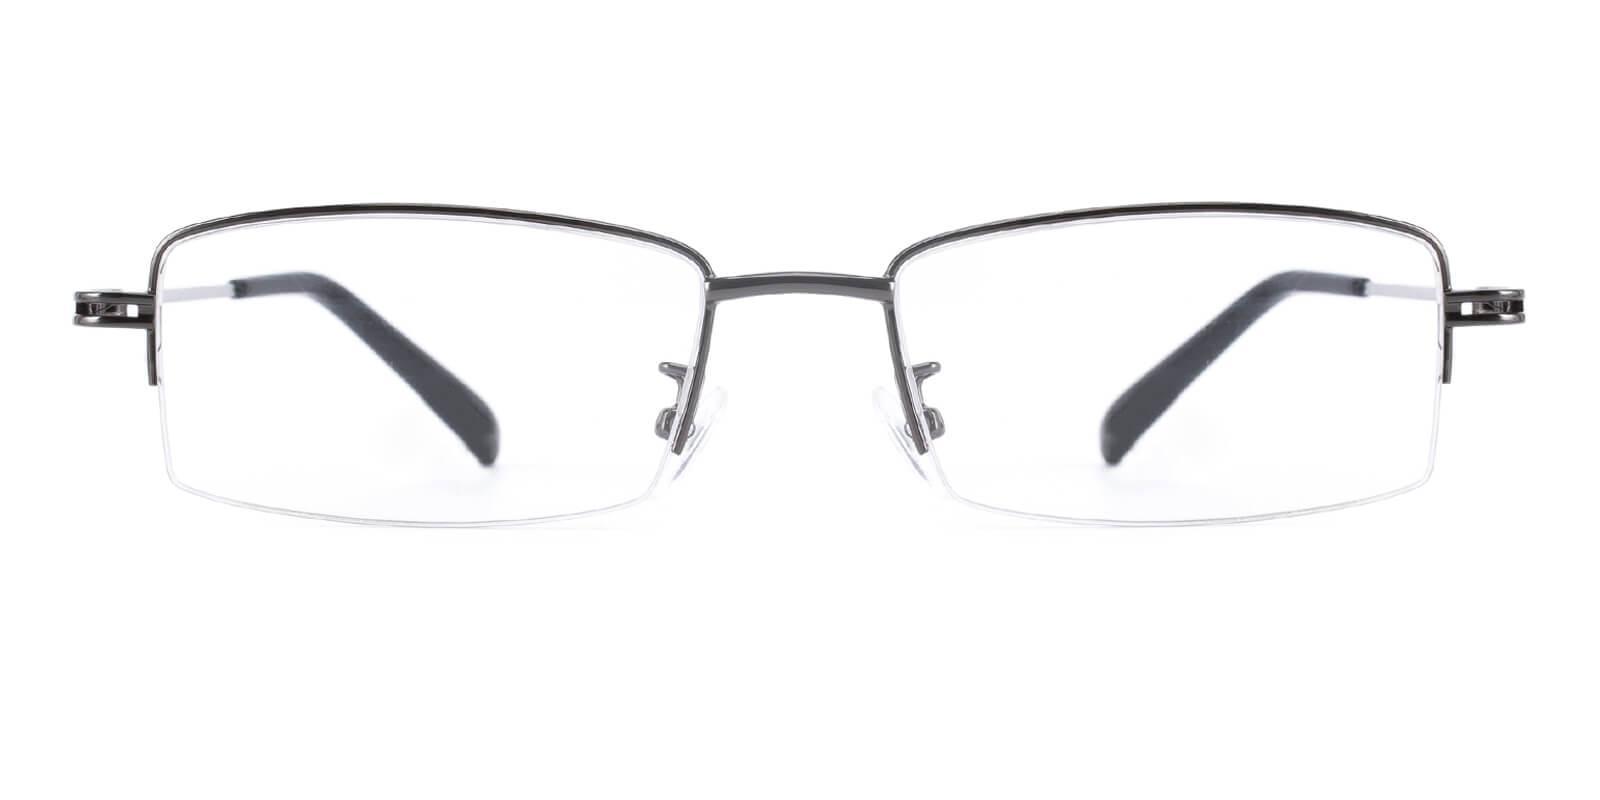 Studio-Gun-Rectangle-Metal-Eyeglasses-additional2